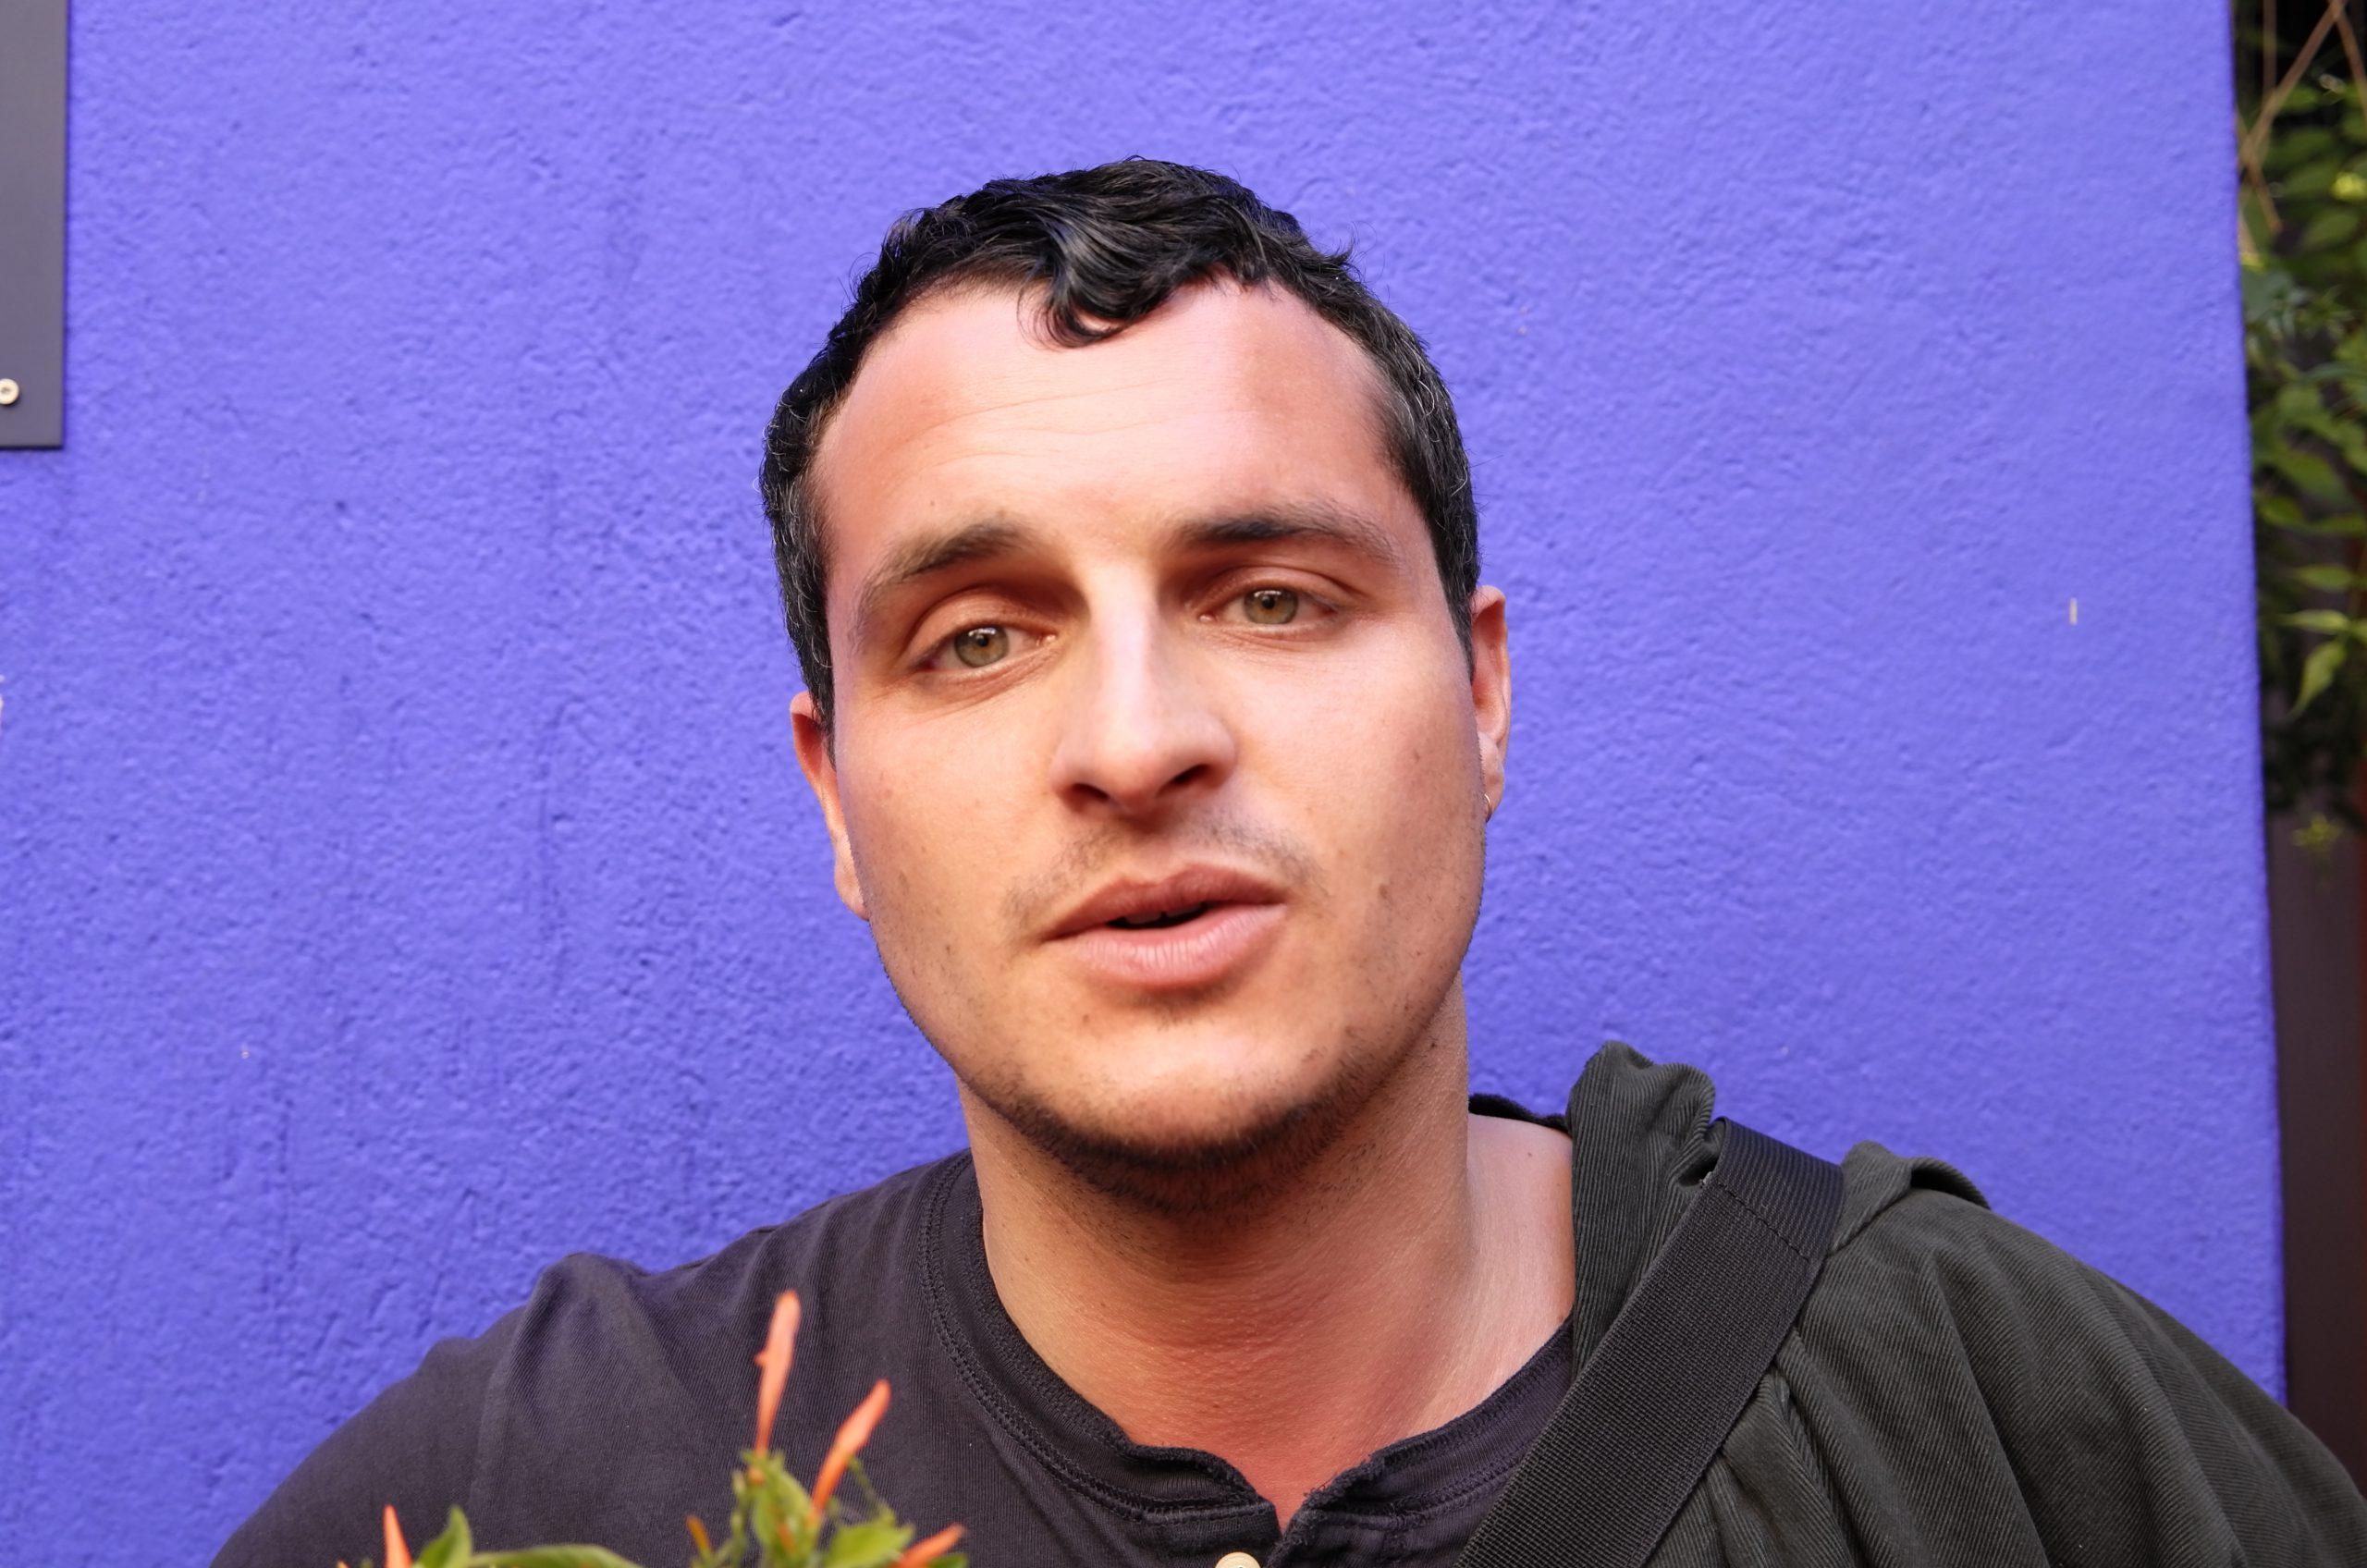 Oliver Malin